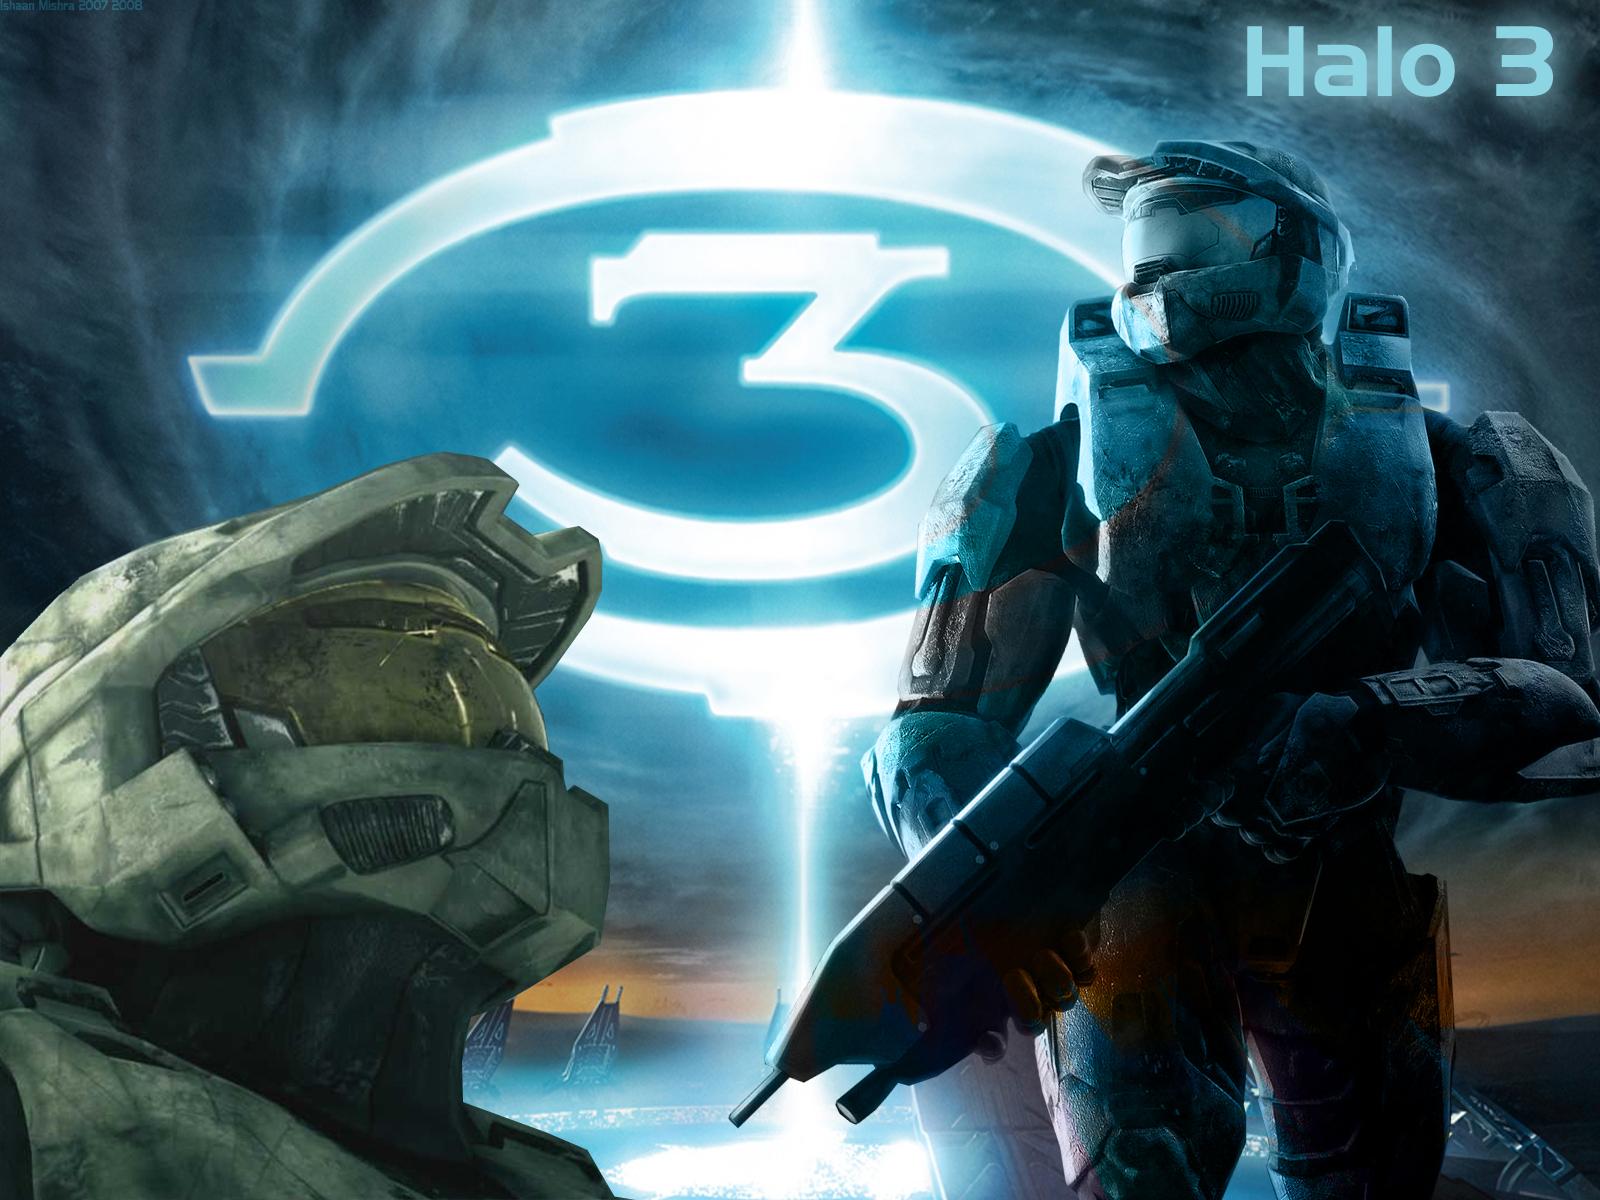 Halo 3 Wallpaper By Ishaanmishra On Deviantart